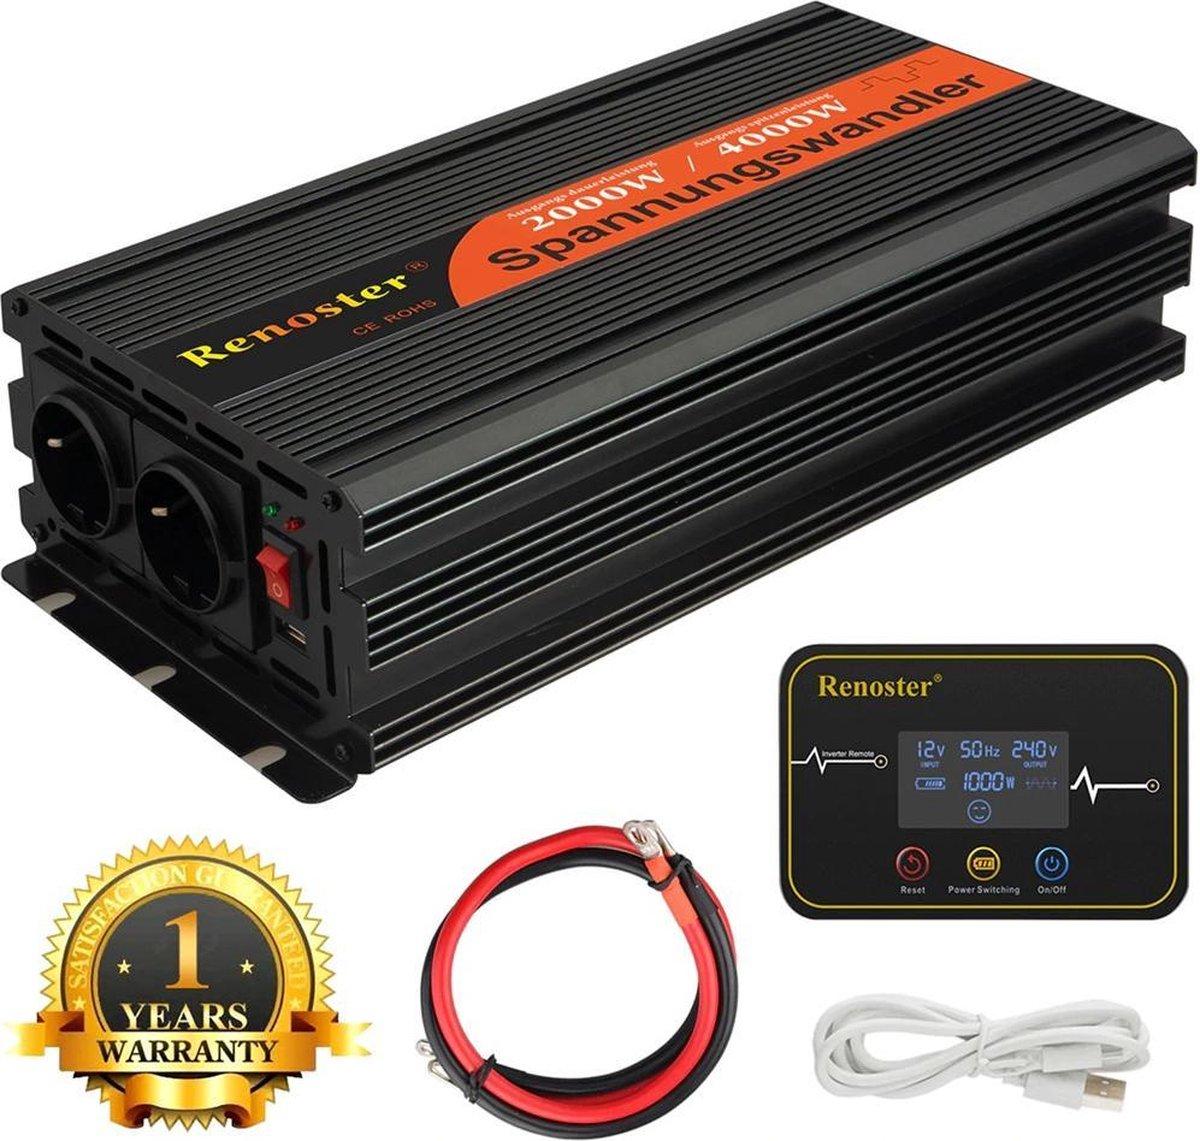 Renoster Zuivere Omvormer 12v 230v - 1x Stopcontact -  1x USB - 1000W/2000W inverter + Draadloze Afs